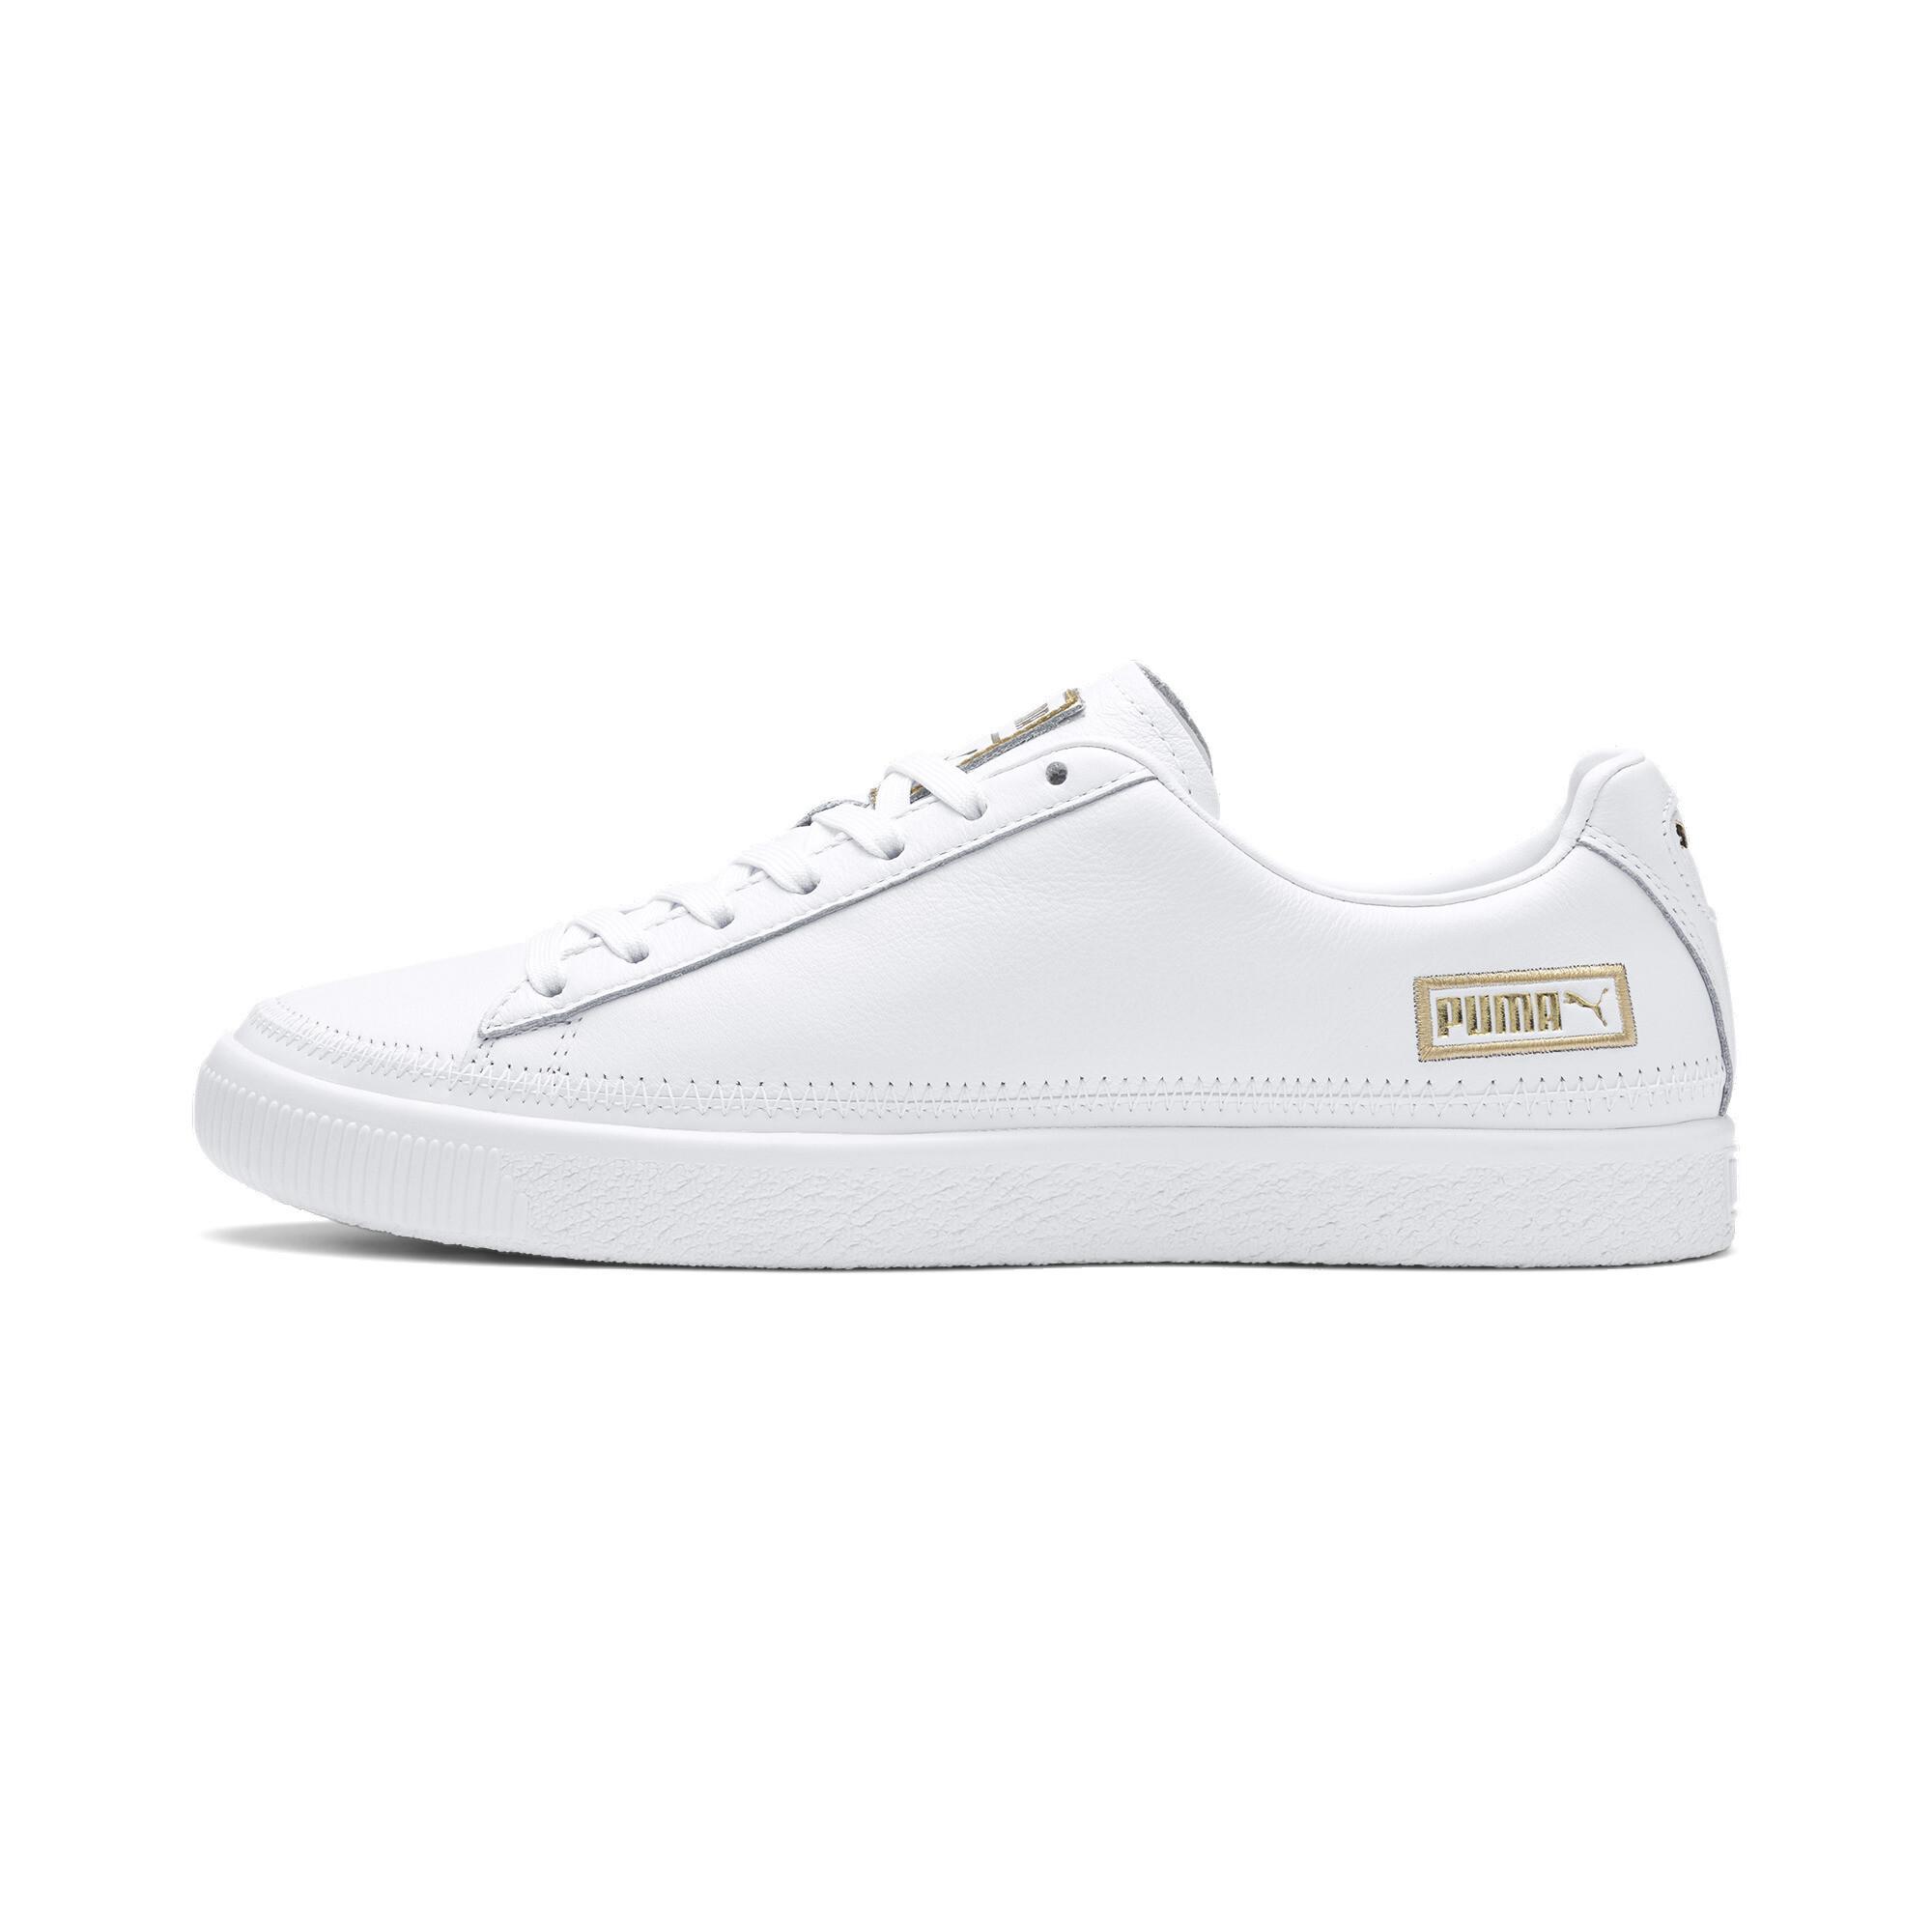 PUMA-Basket-Stitch-Sneaker-Unisex-Schuhe-Neu Indexbild 4